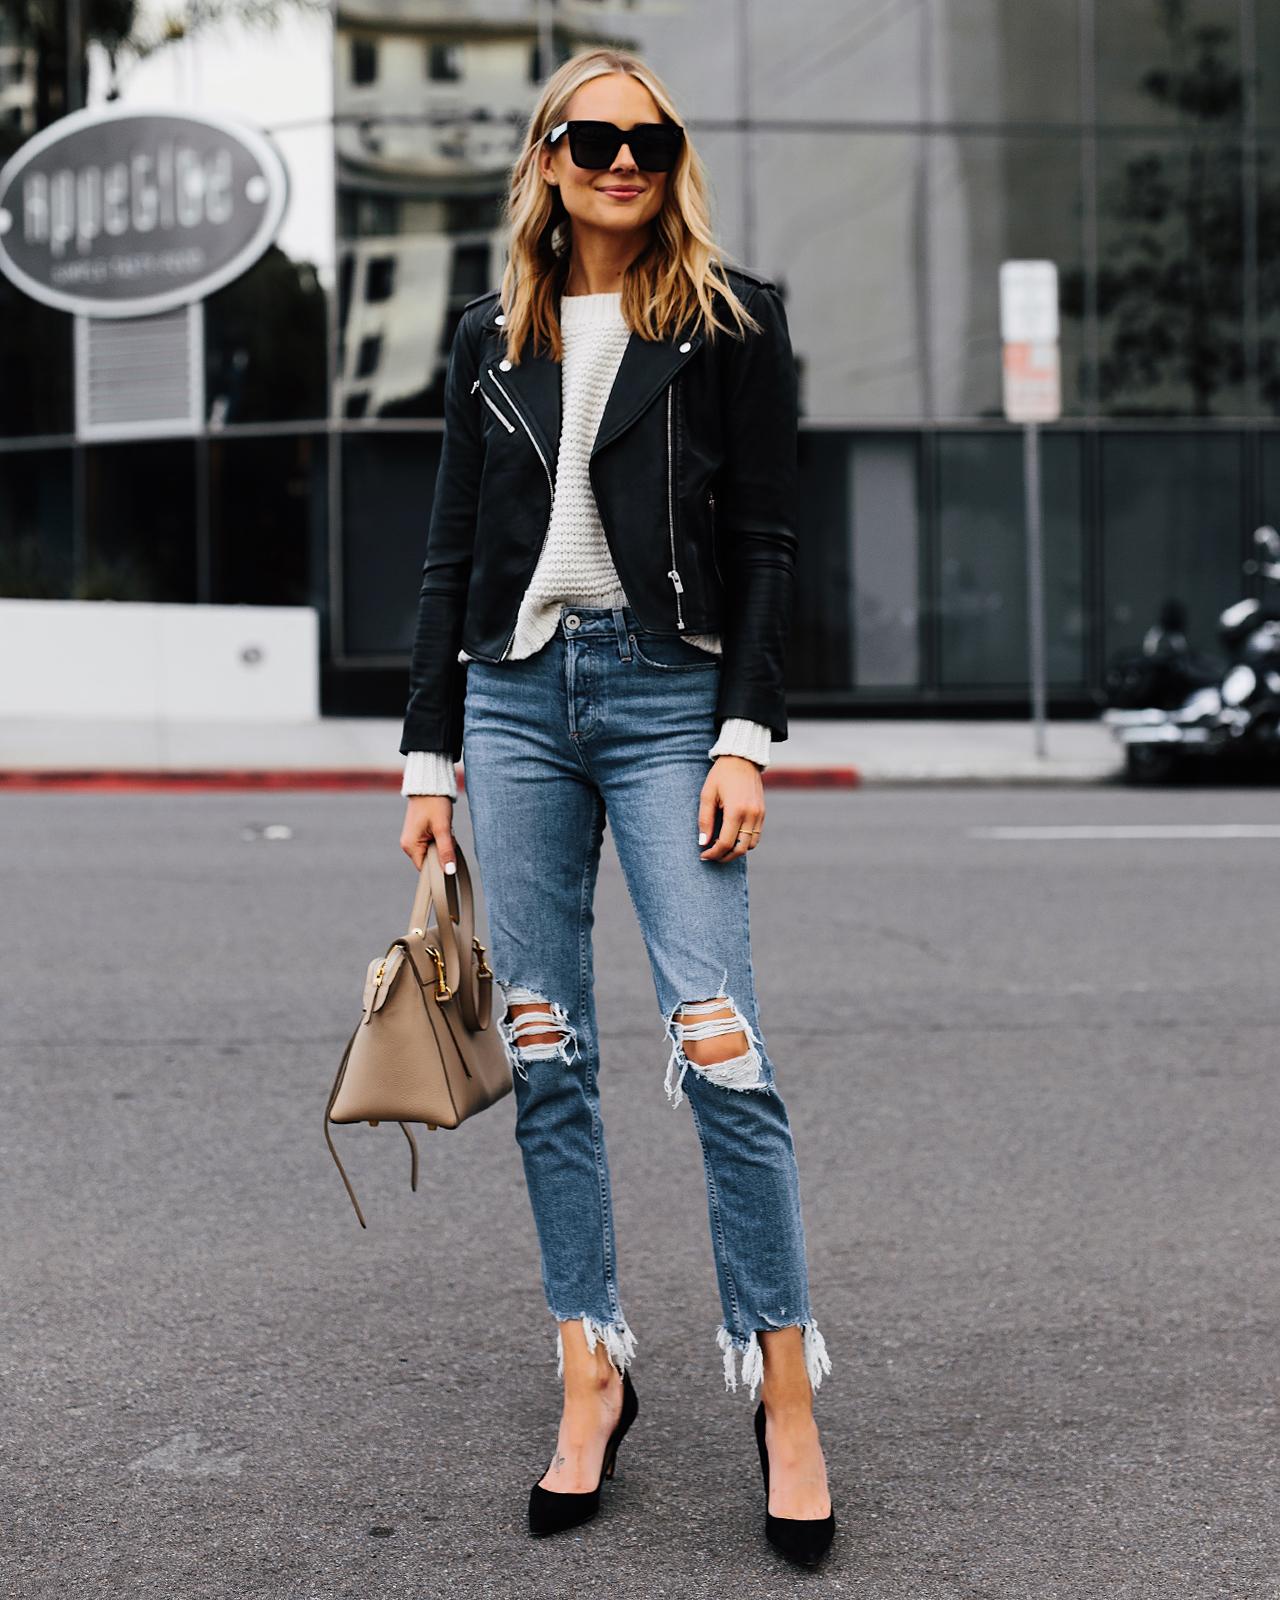 Fashion Jackson Wearing Black Leather Jacket White Sweater Paige Hoxton Ankle Jeans